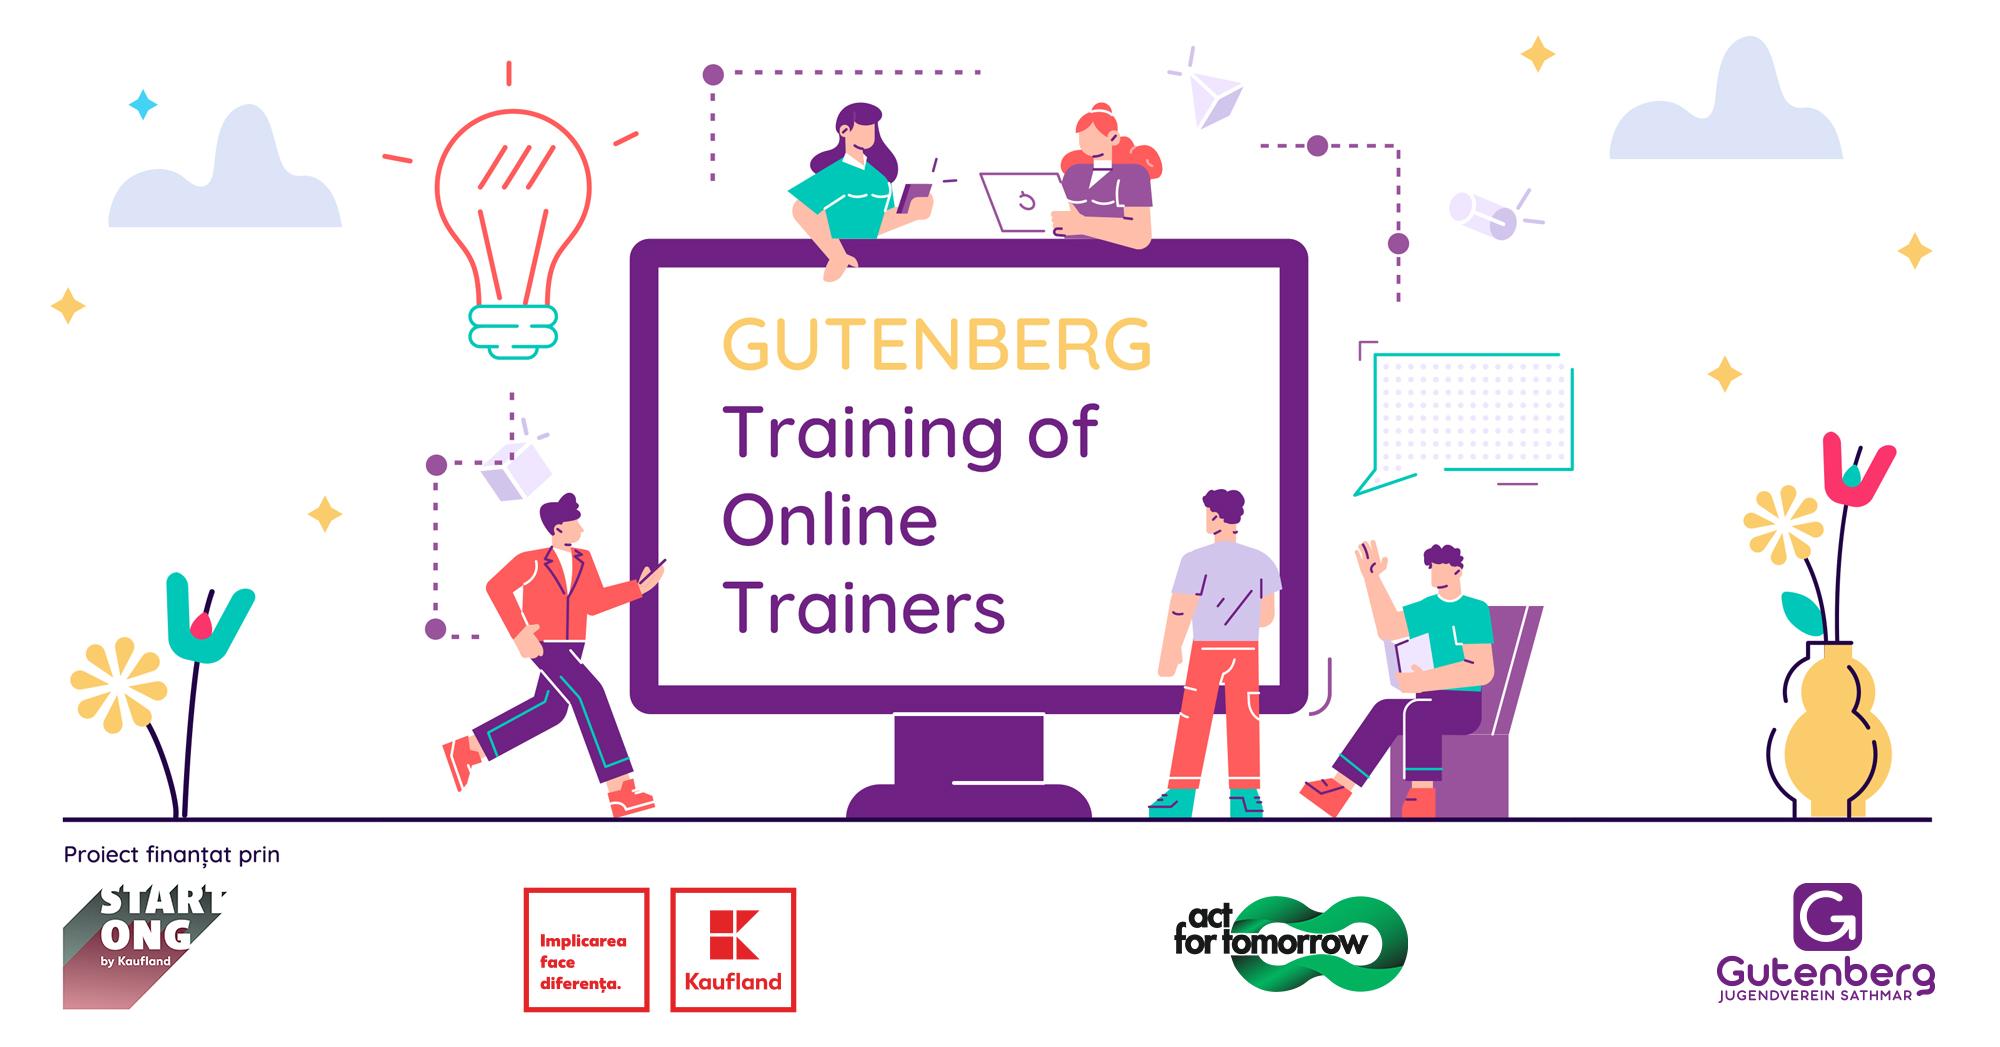 Gutenberg Training of Online Trainers